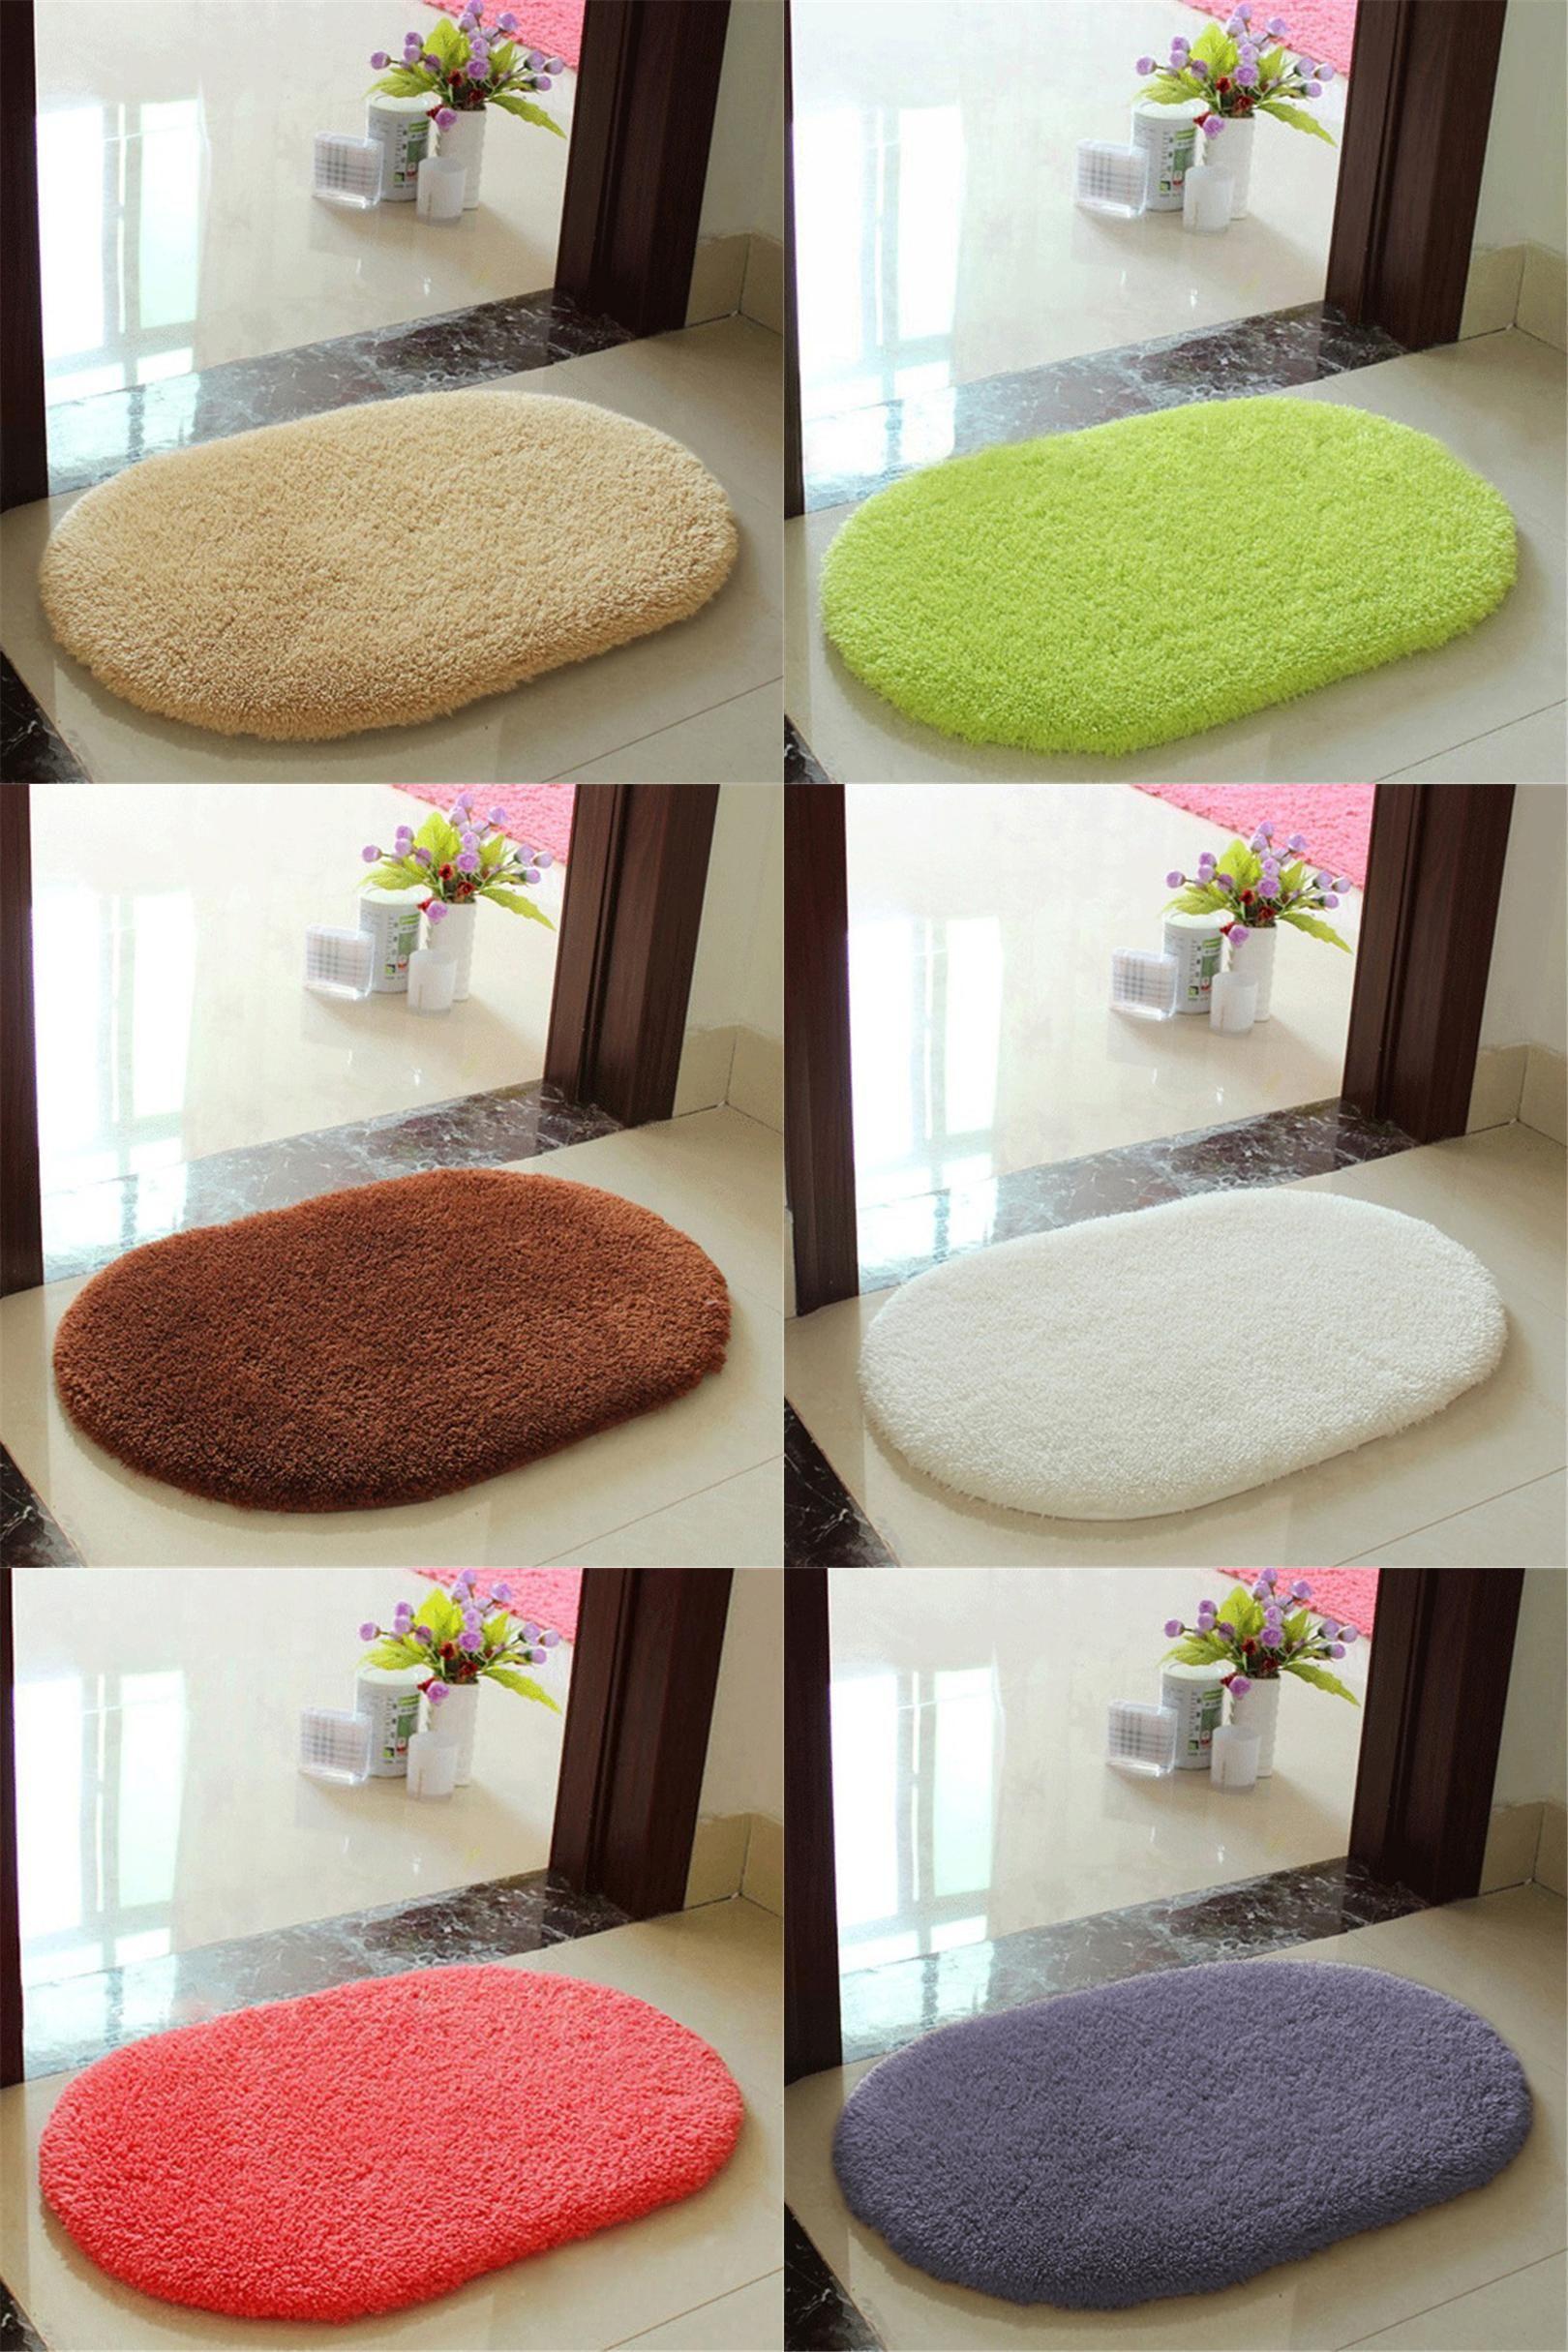 Visit To Buy Fashion Bath Mat Bathroom Plush Velvet Slip - Non skid bath rug for bathroom decorating ideas